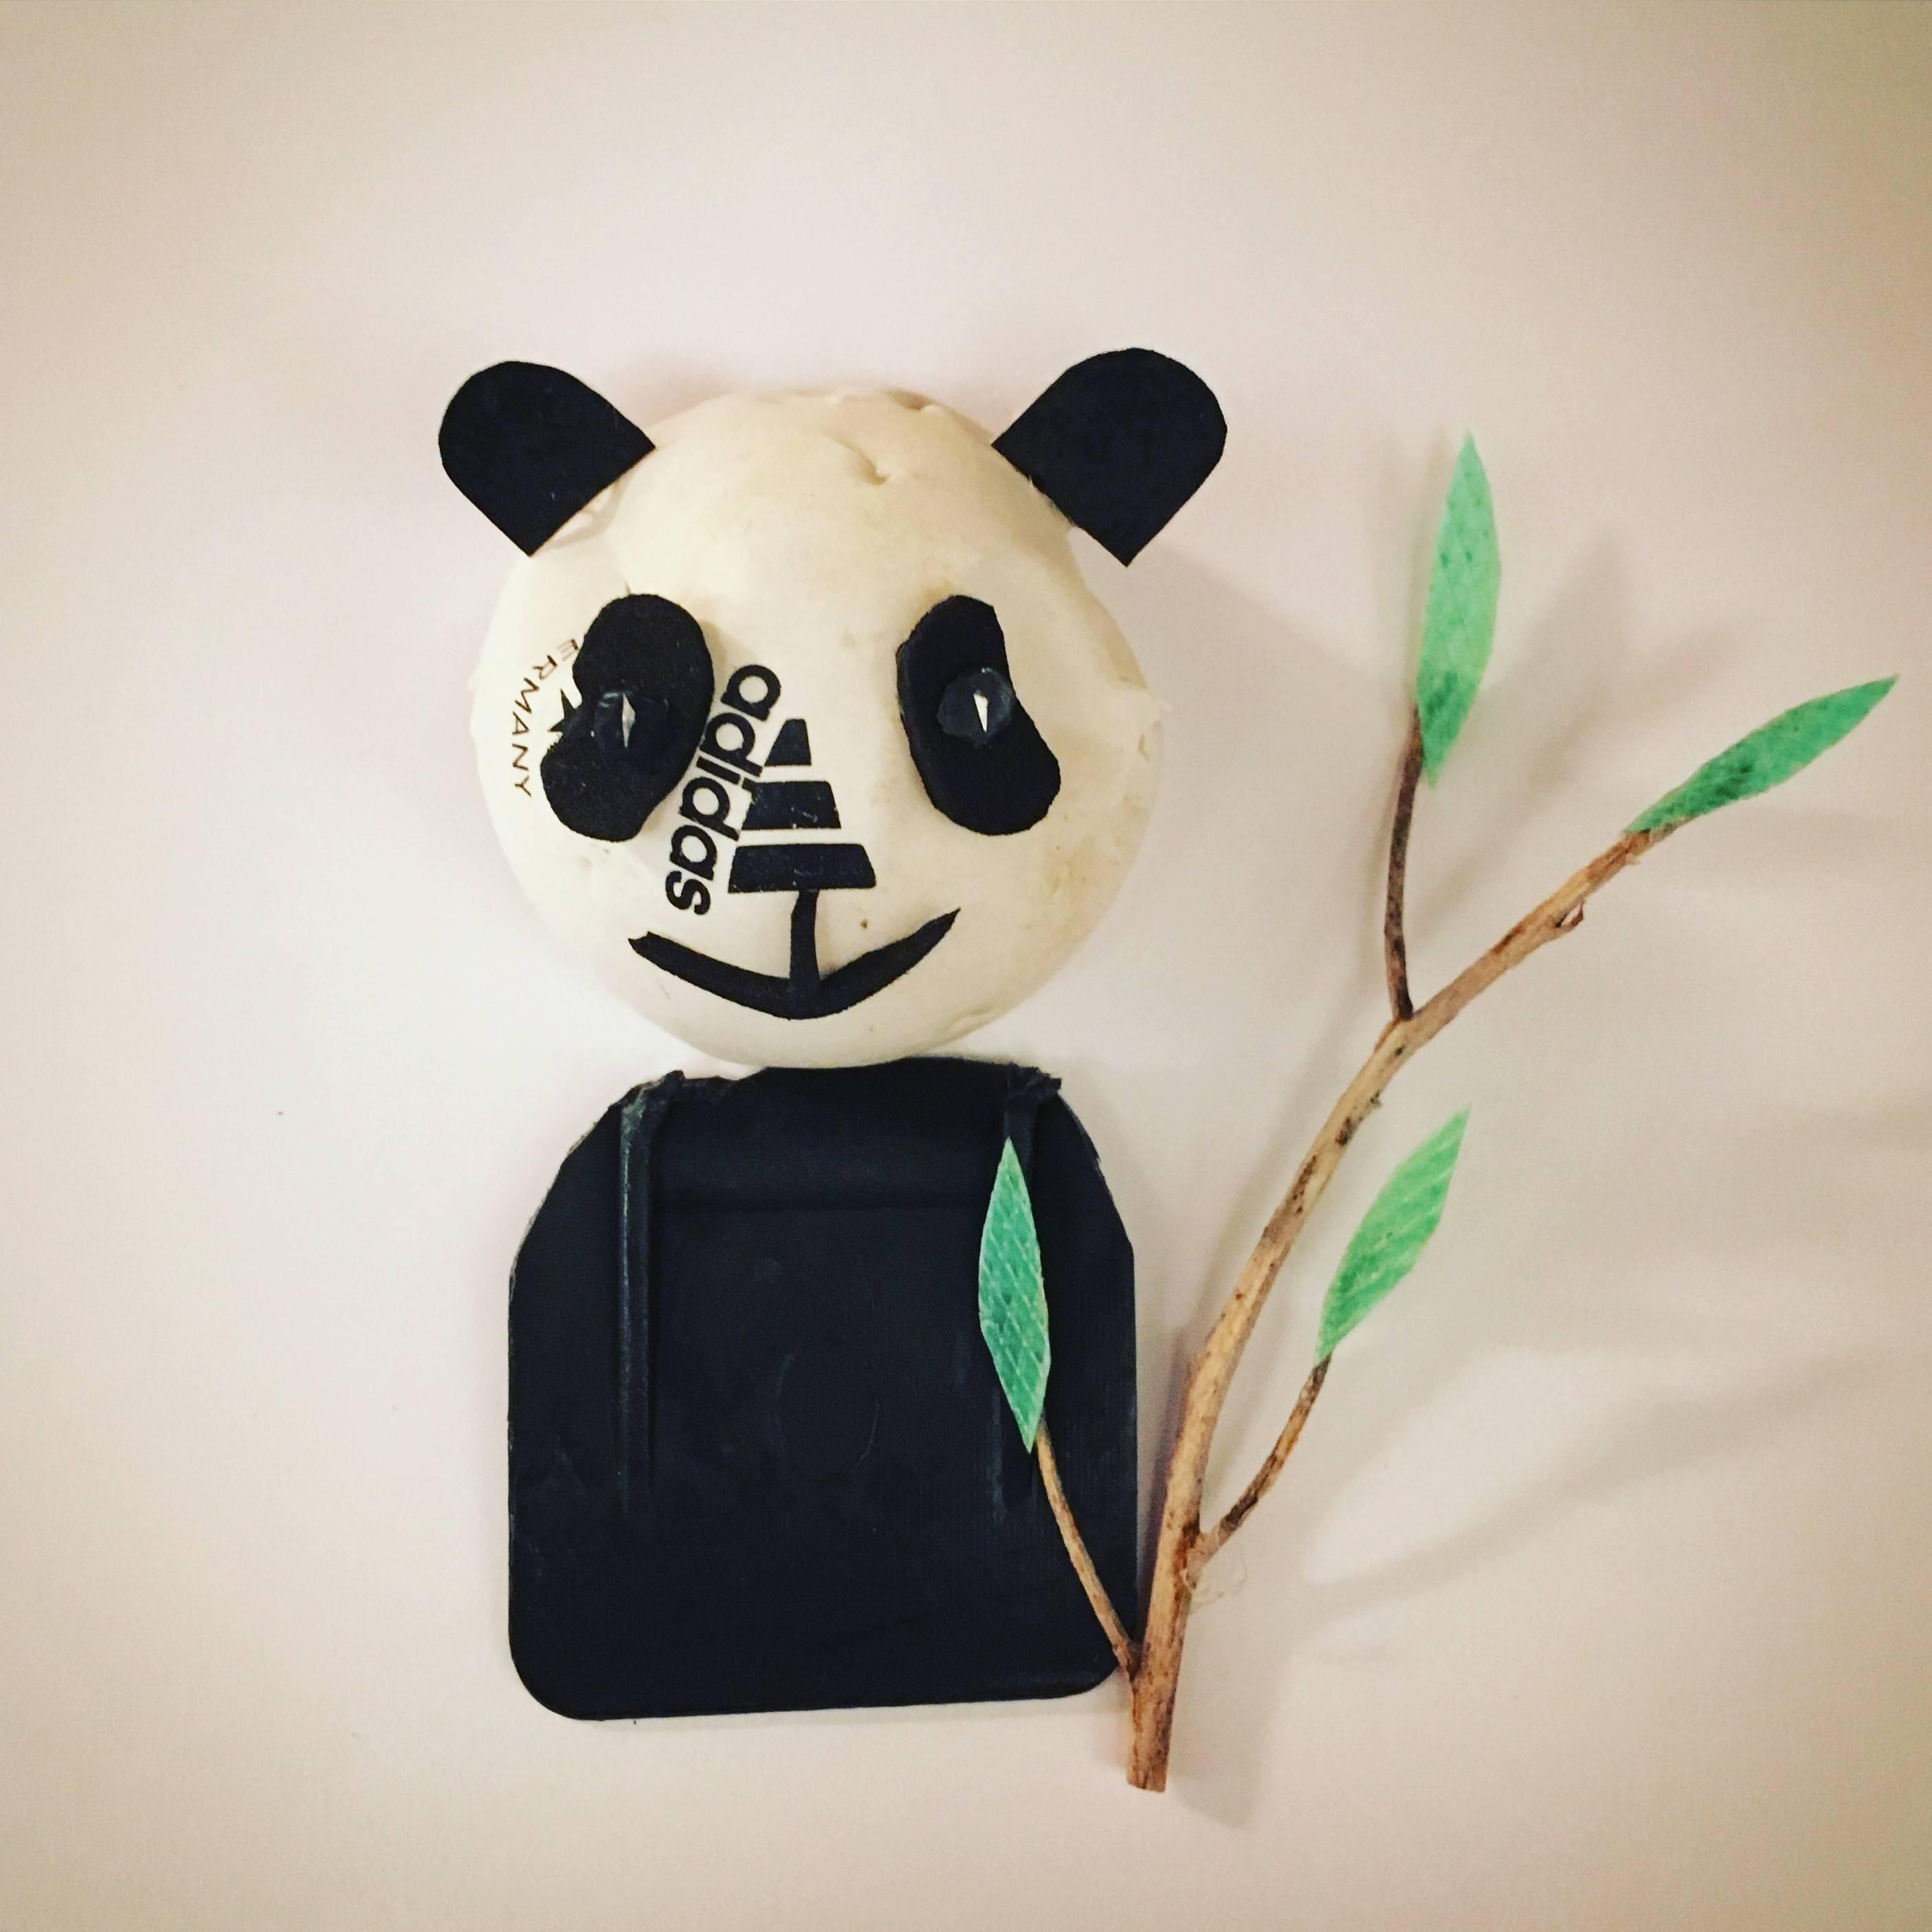 PERRY THE PANDA